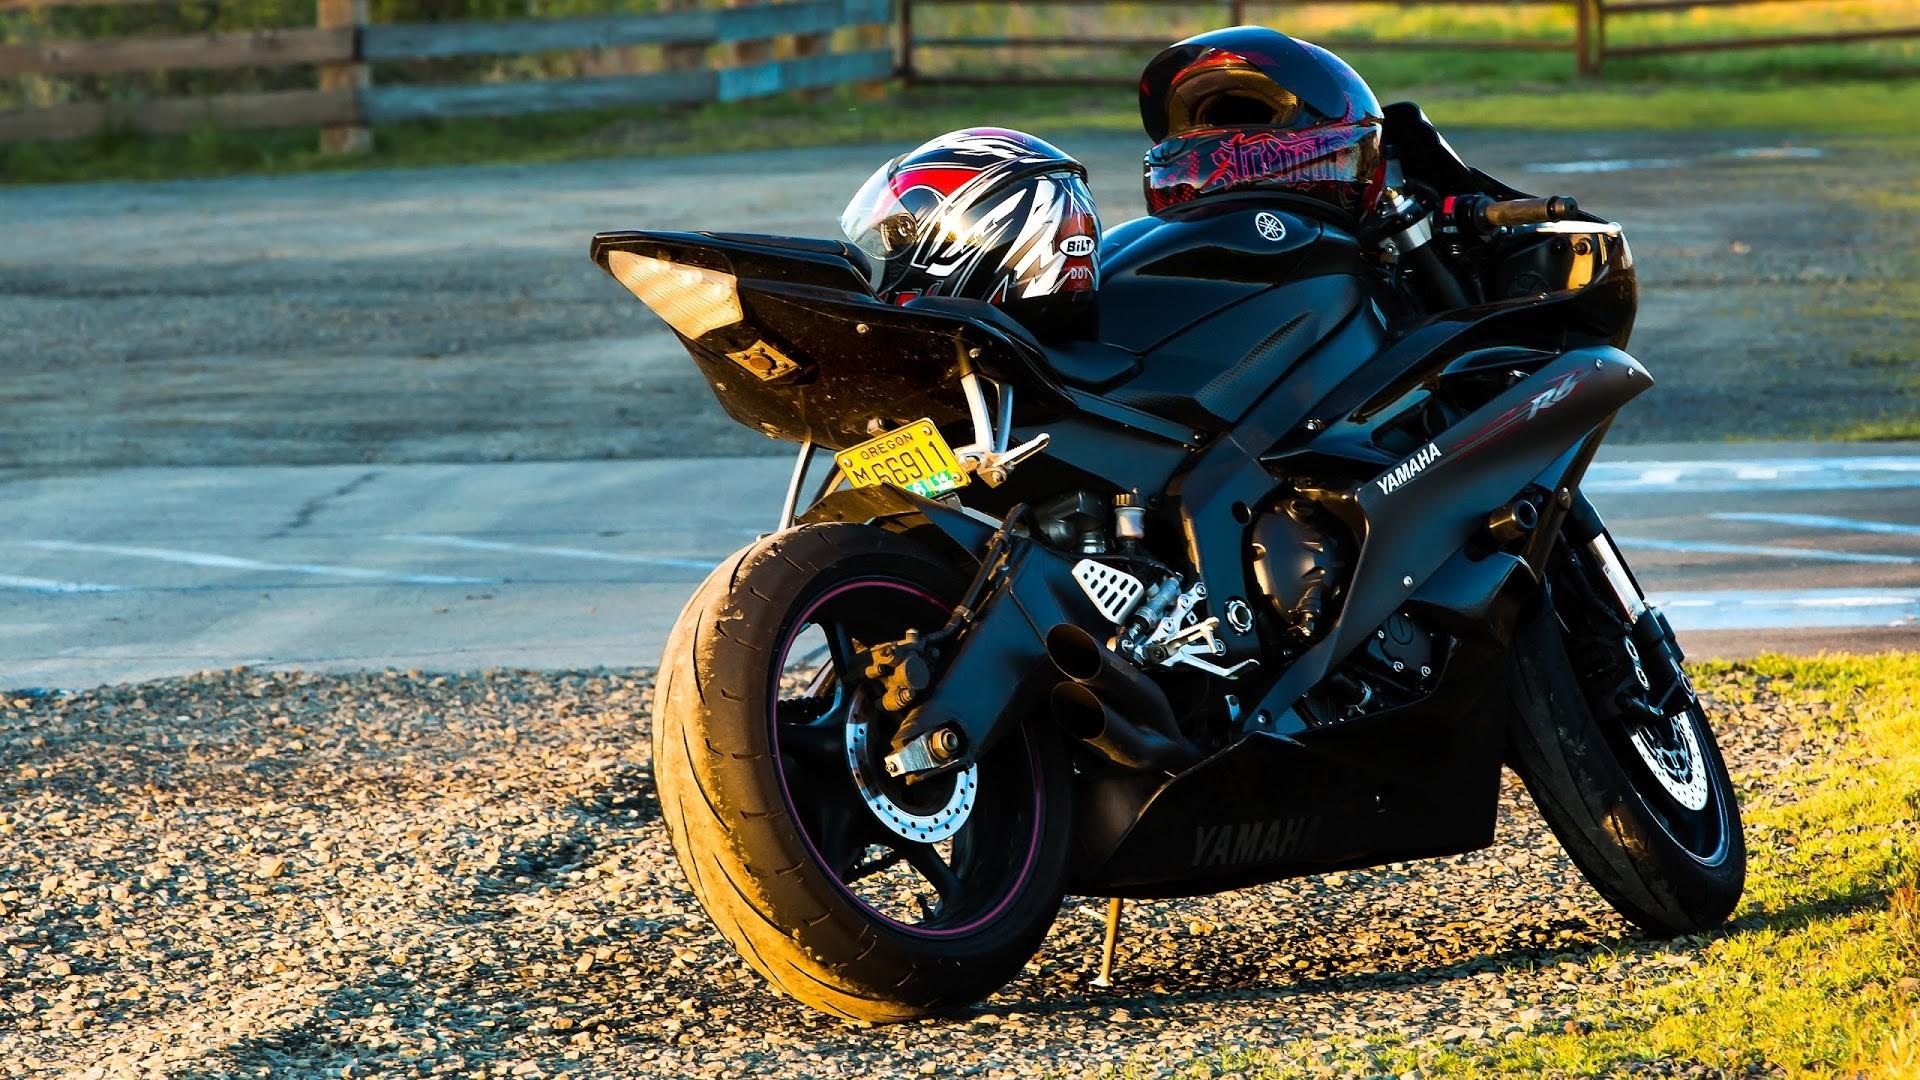 4K HD Wallpaper: Motorcycle. Super Bike. Yamaha R6